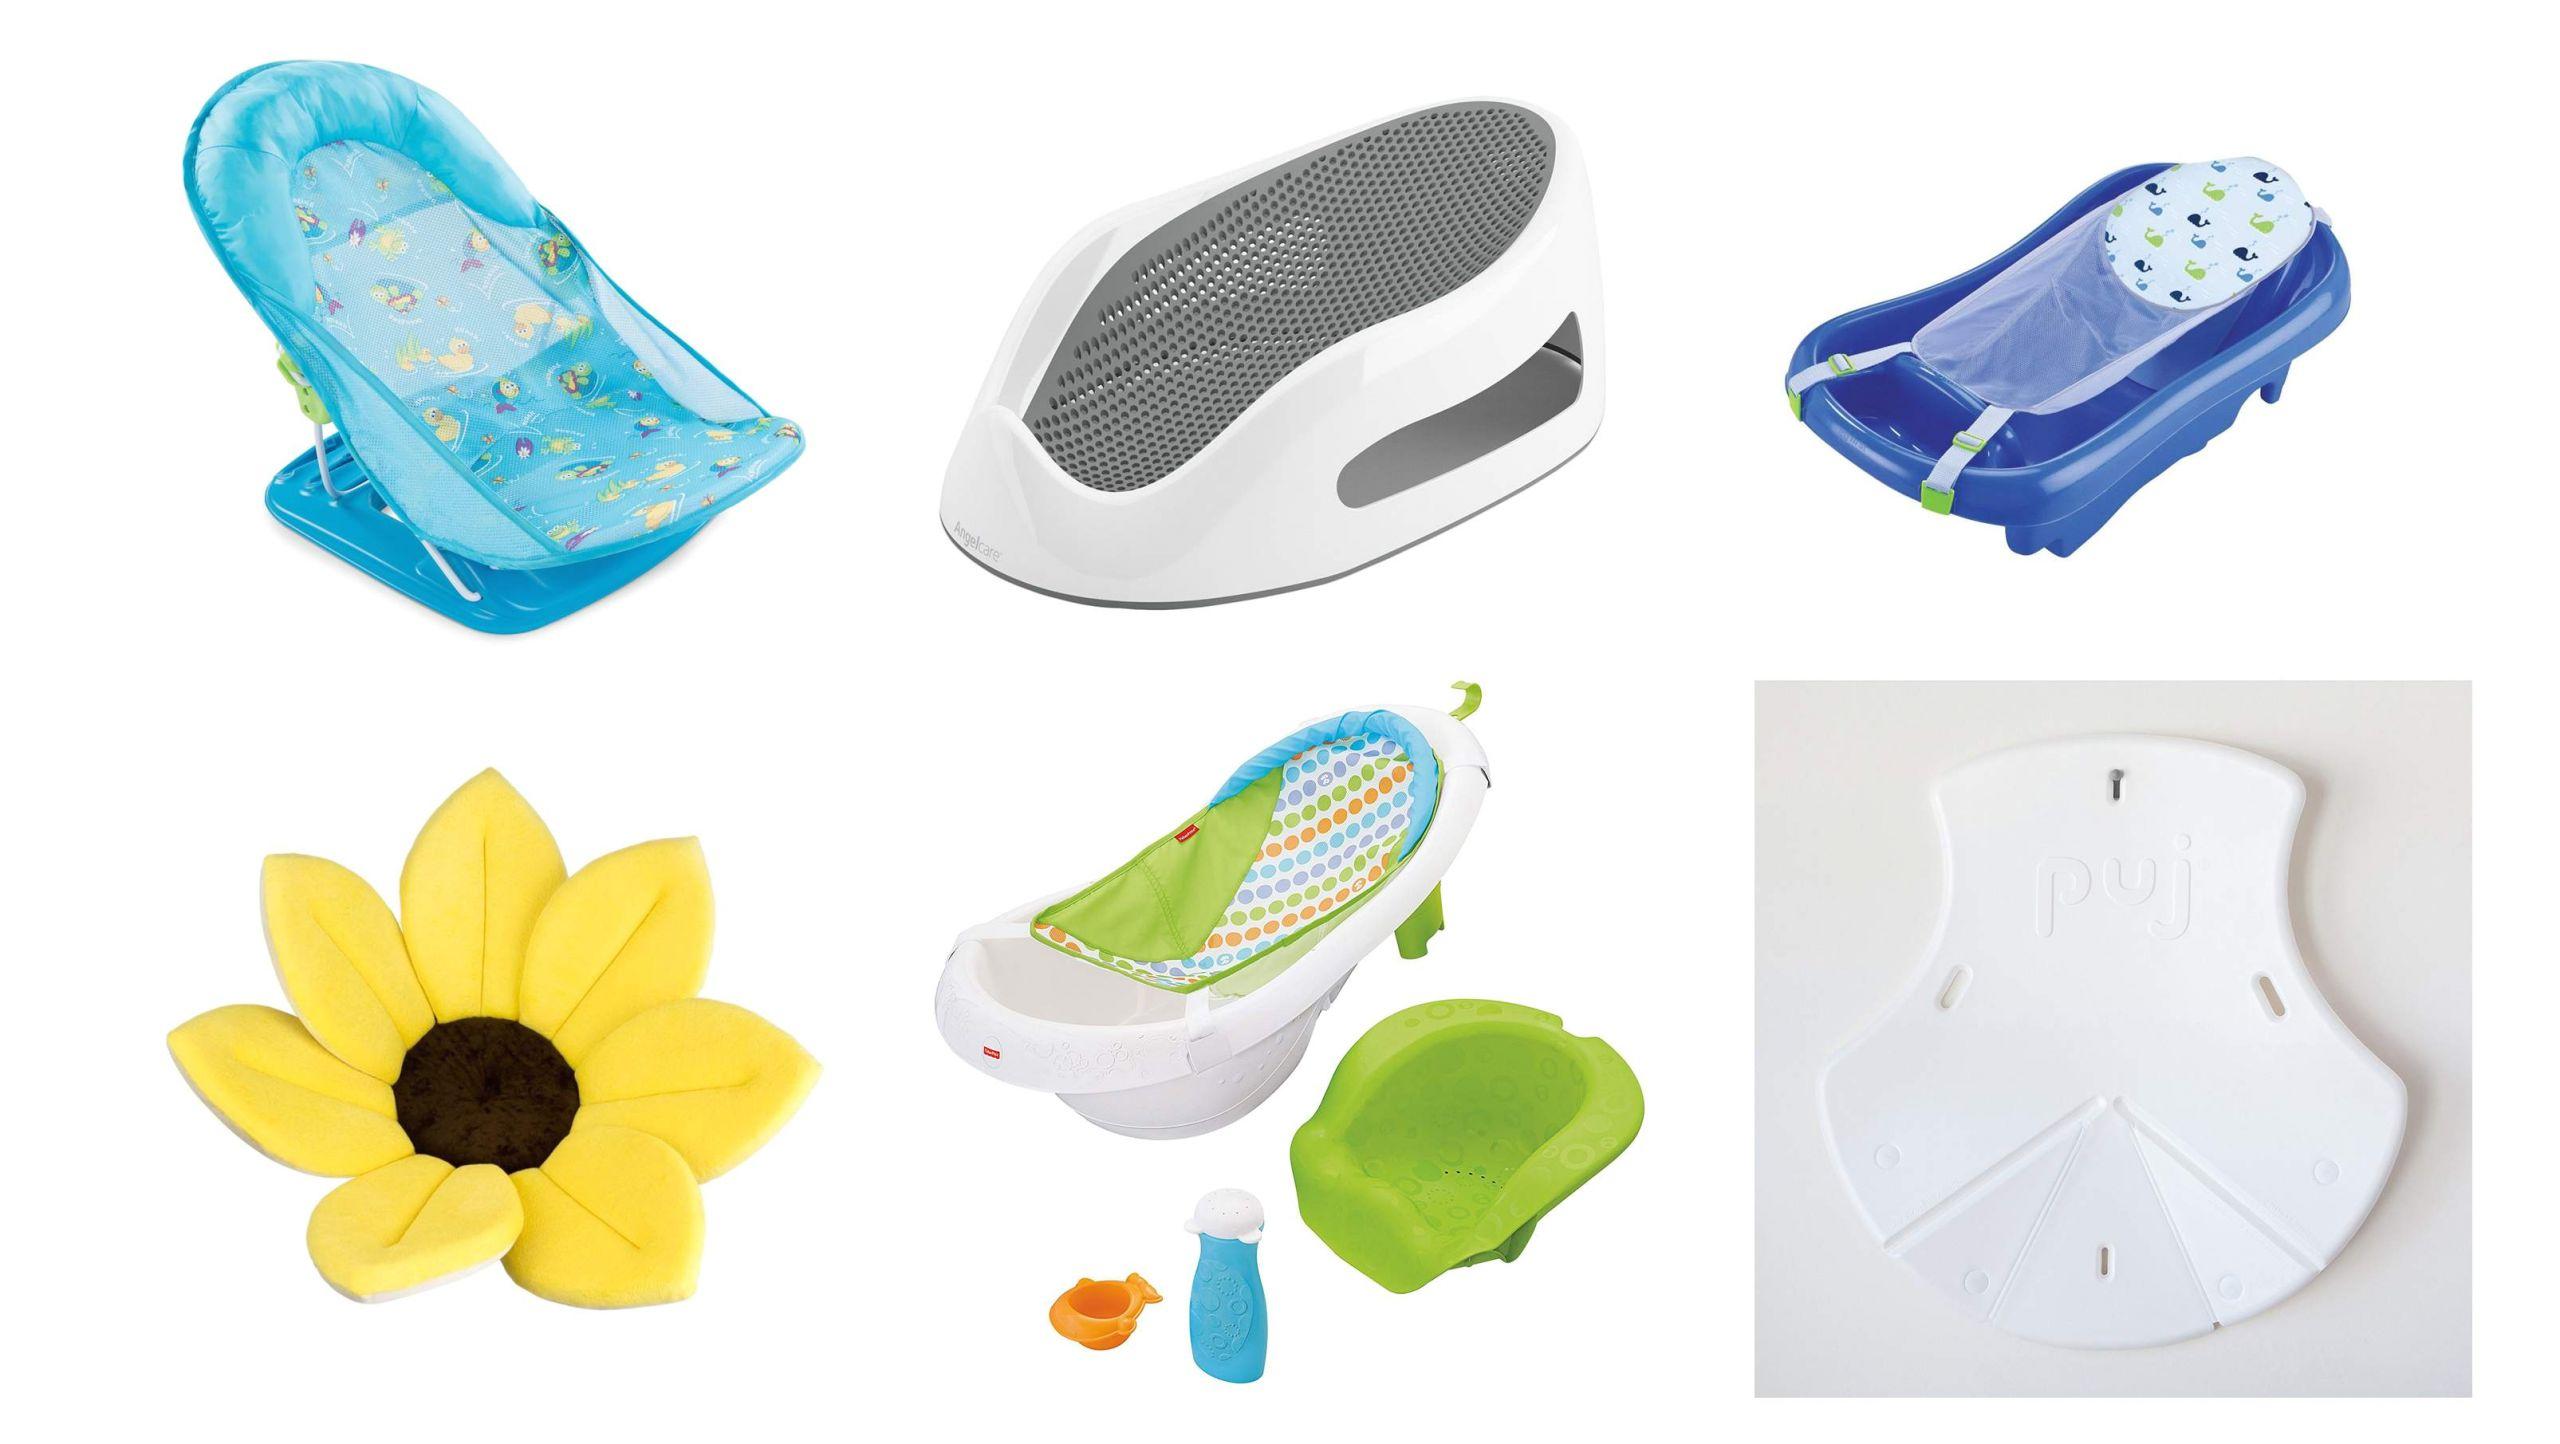 Top Rated Baby Bathtub top 10 Best Infant Bath Tubs & Bath Seats